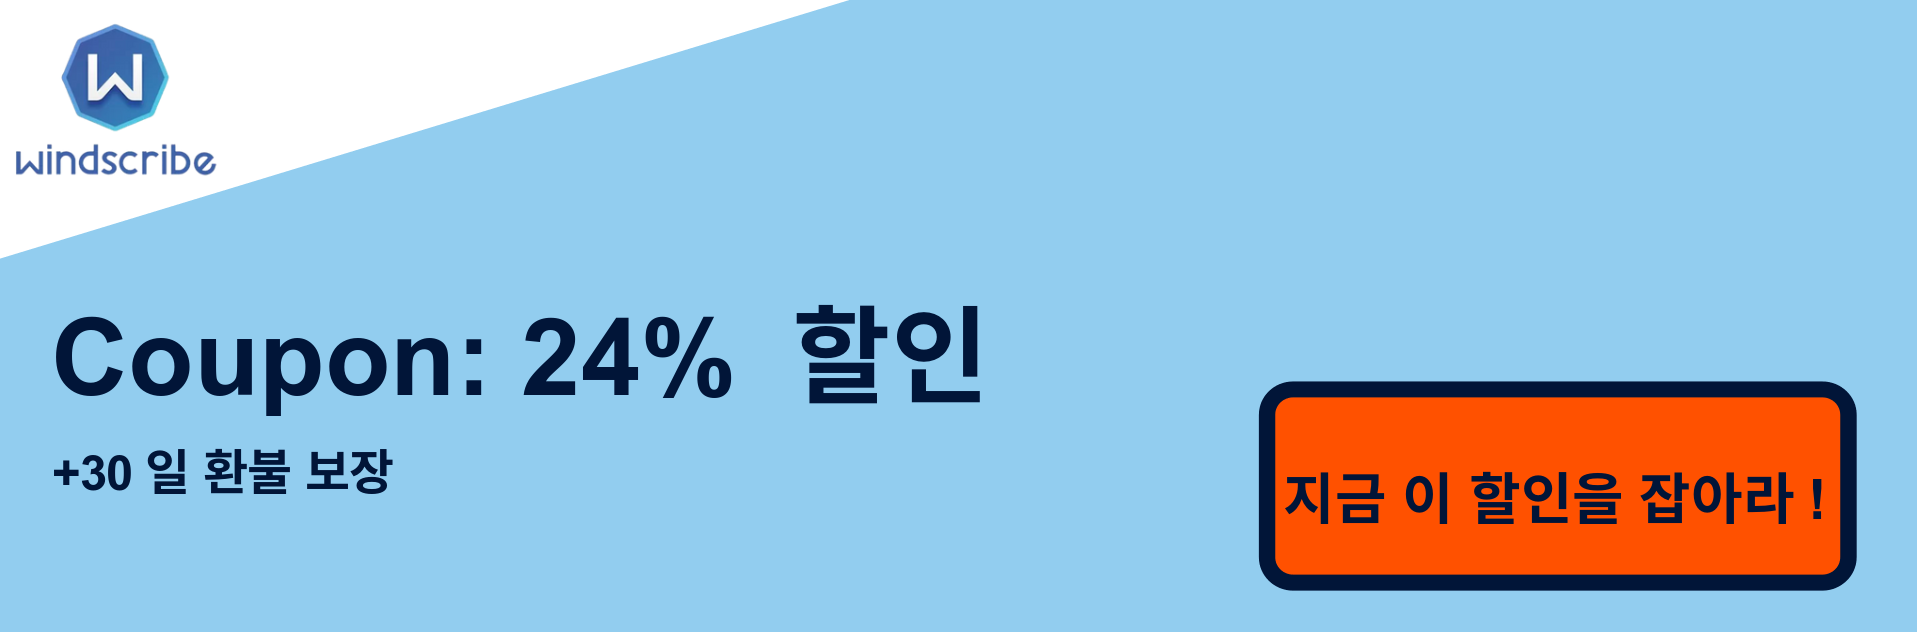 WindScribe VPN 쿠폰 배너-24 % 할인